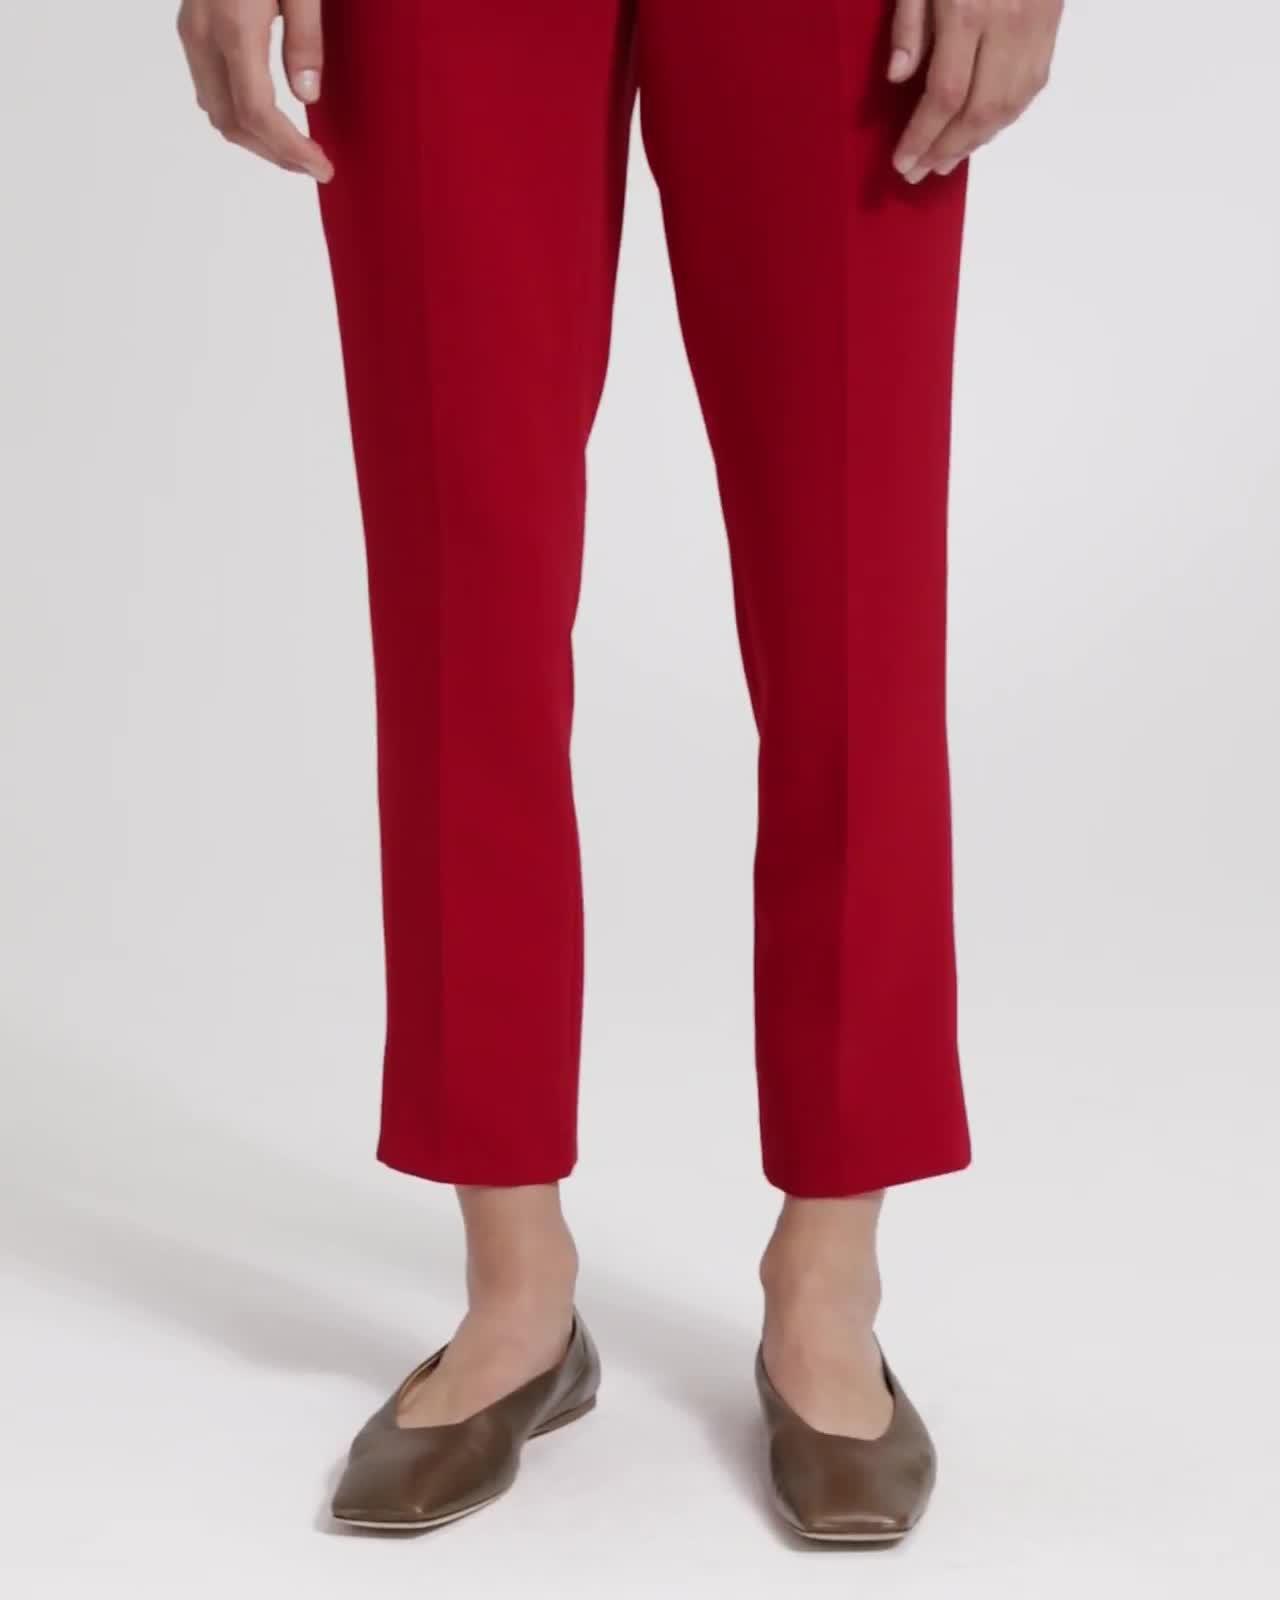 Crepe Basic Pull-On Pant